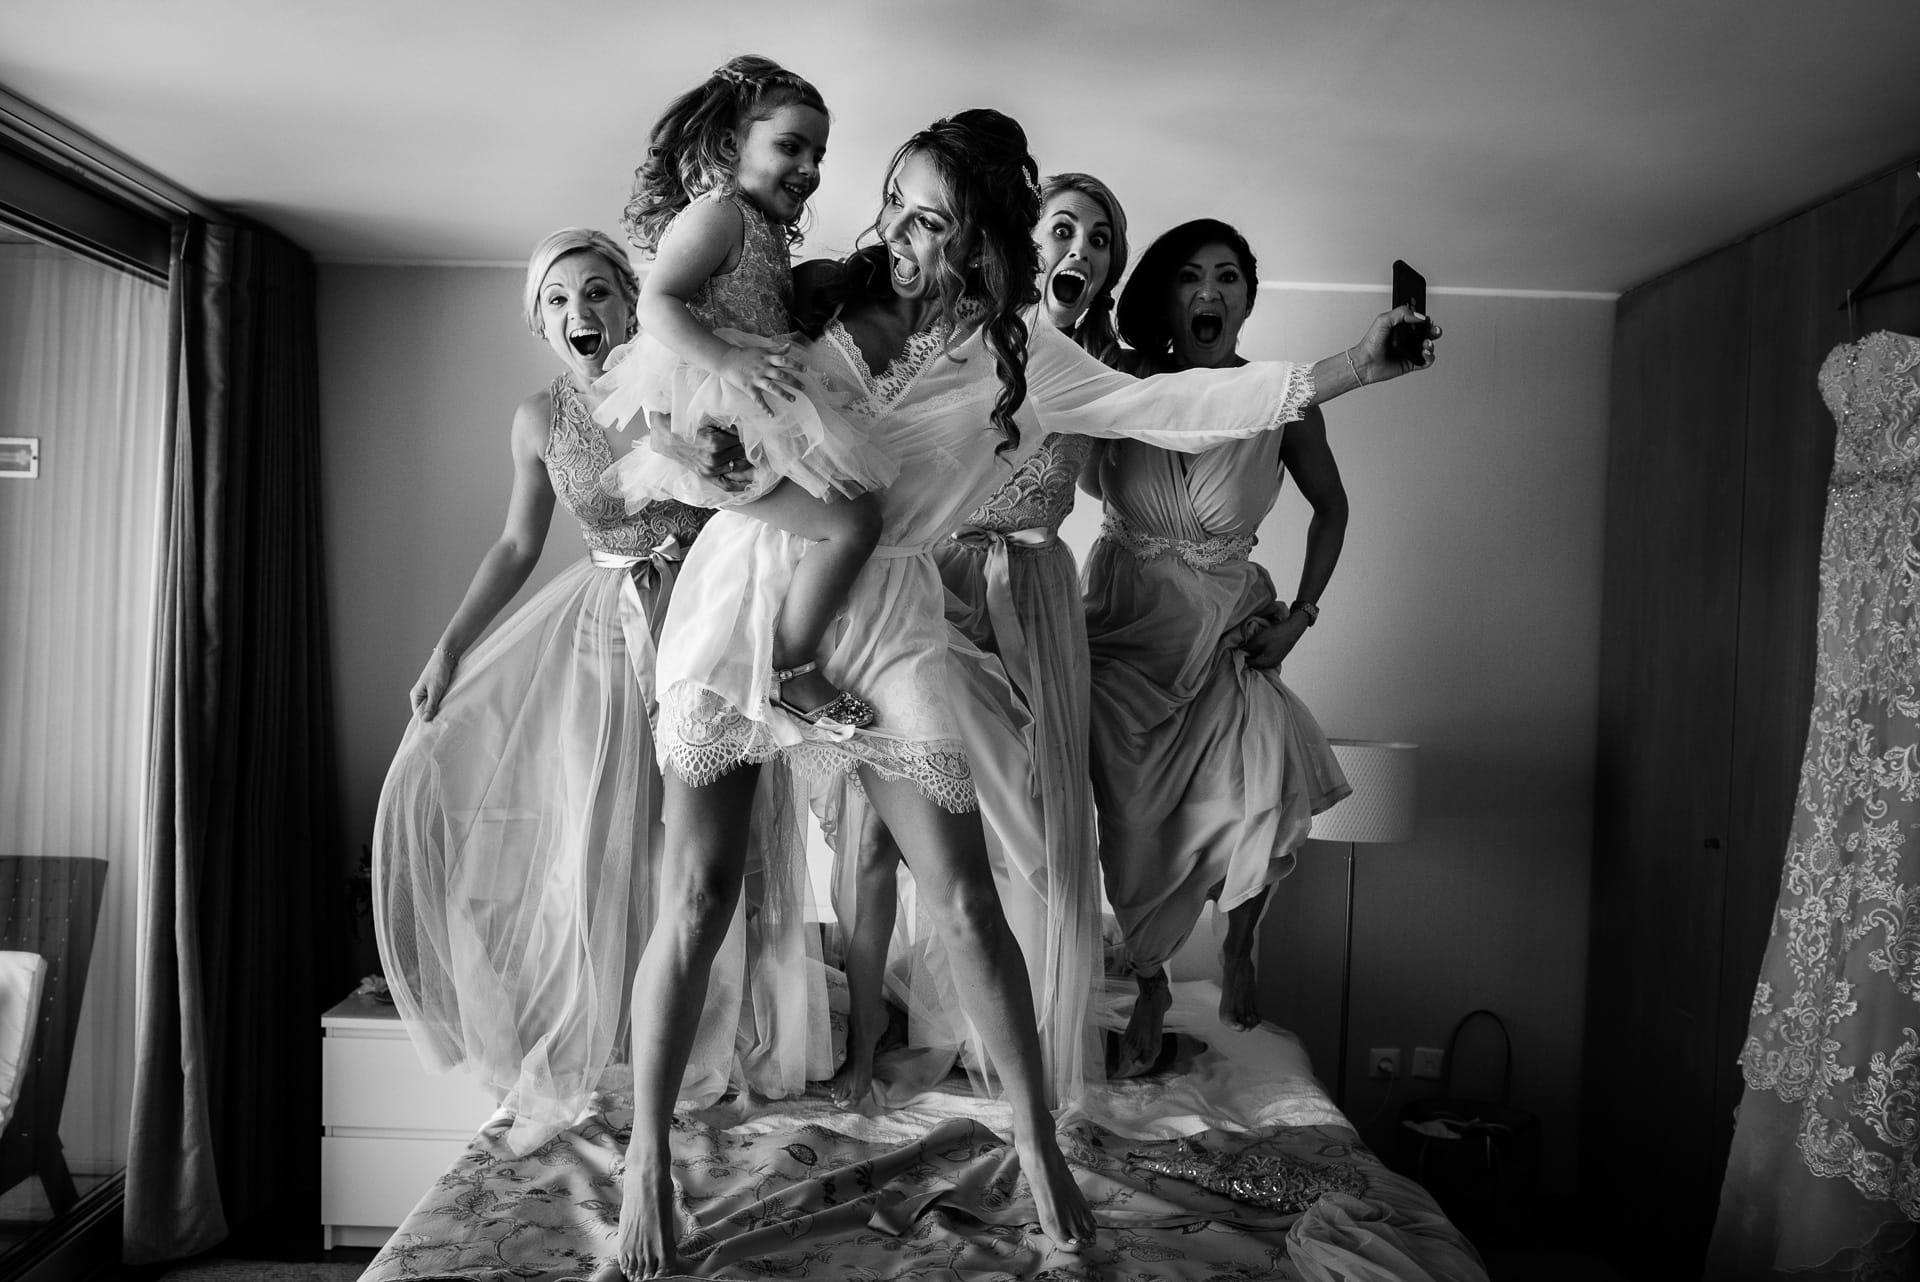 Wedding - Candice & Marco - Porto - Photo by Luis Efigenio